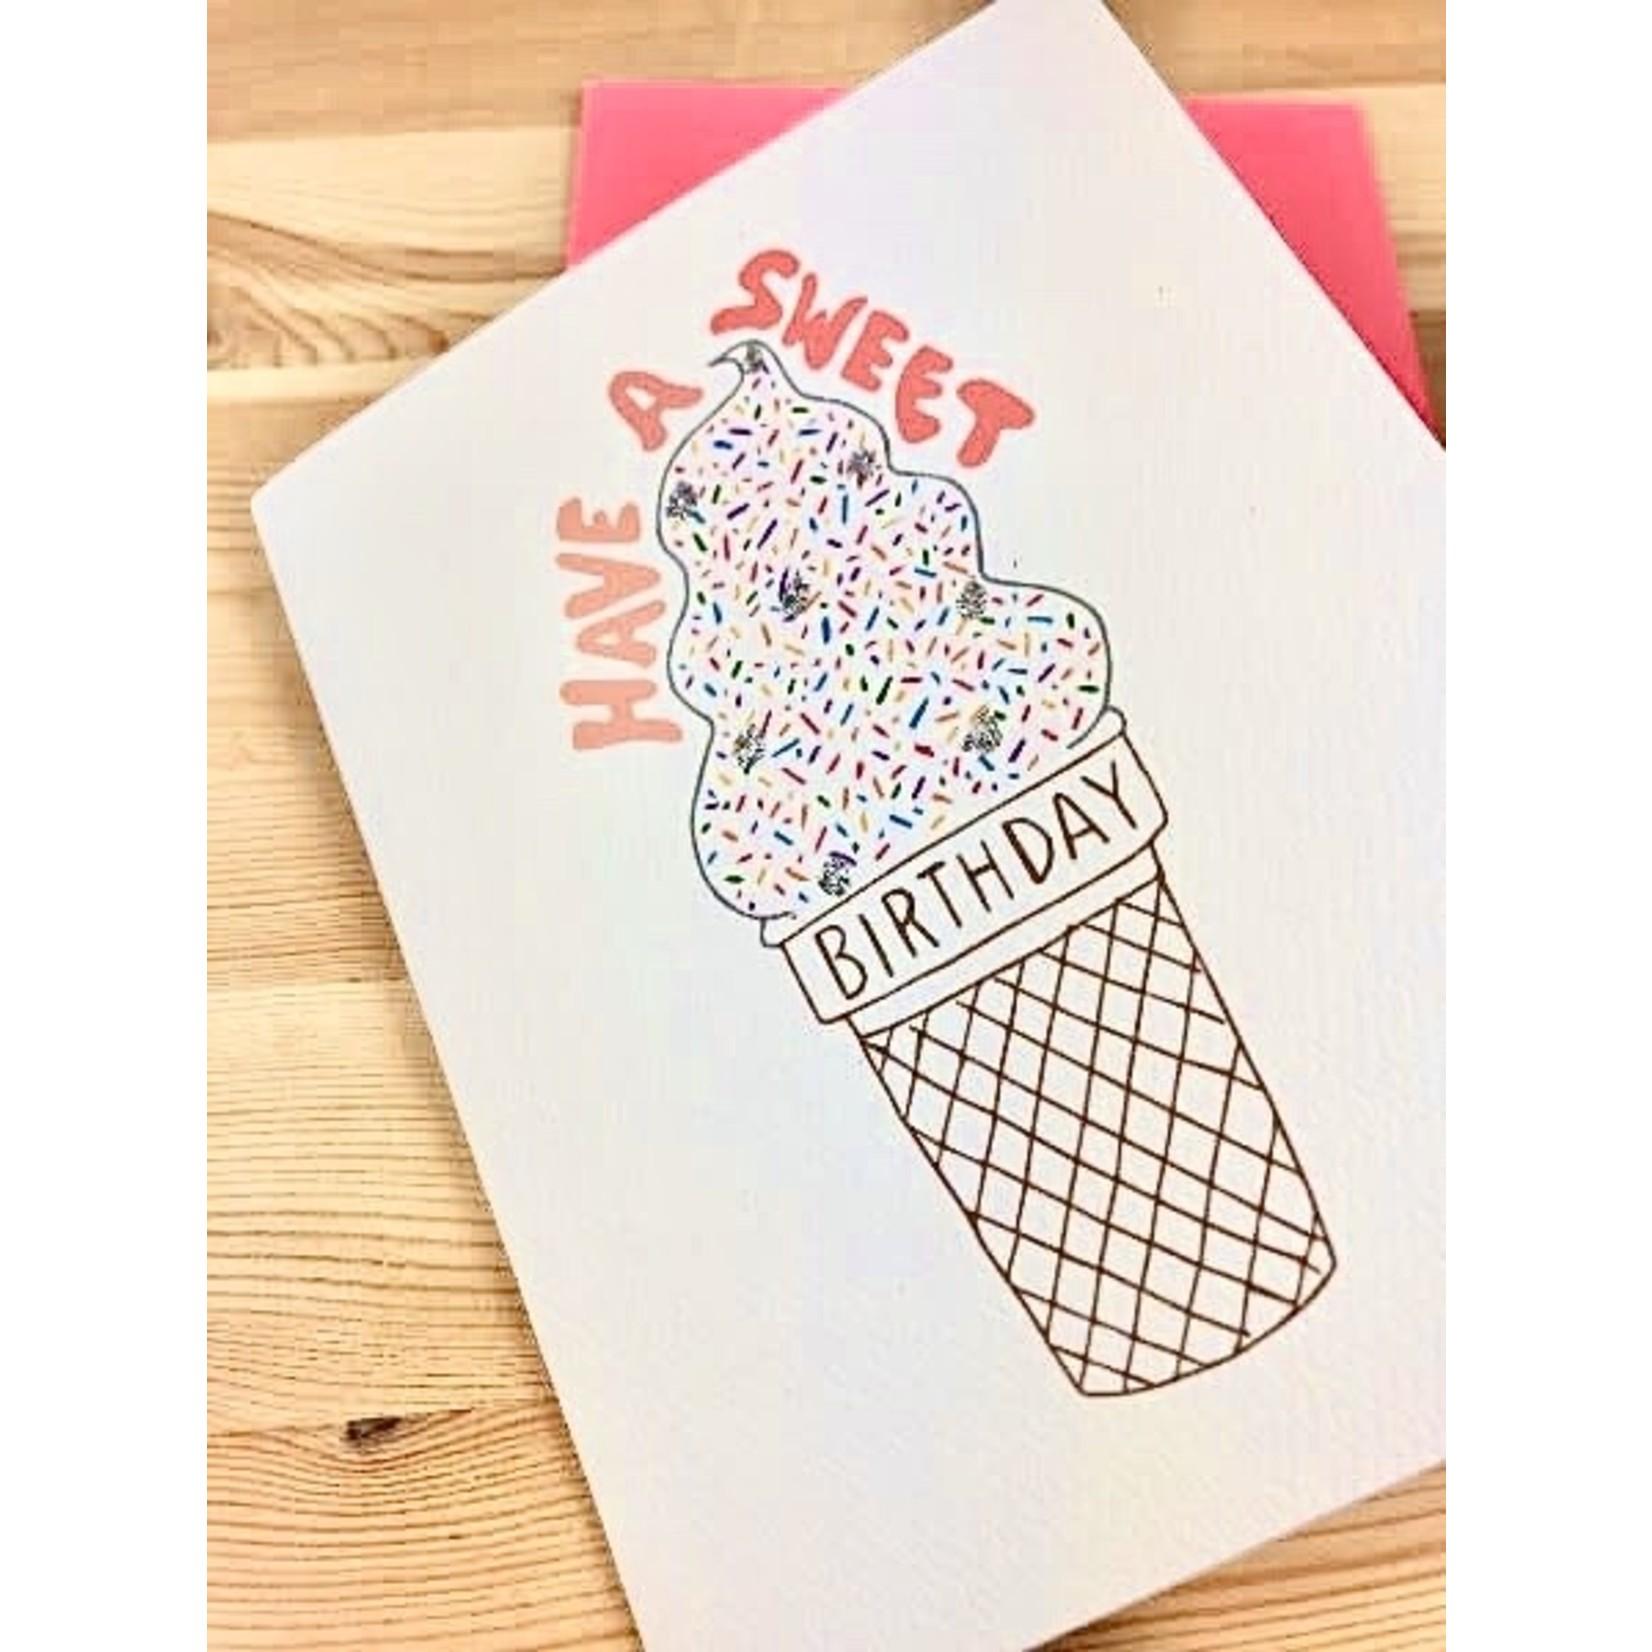 Cracked Designs Sweet Birthday Ice Cream Cone Greeting Card